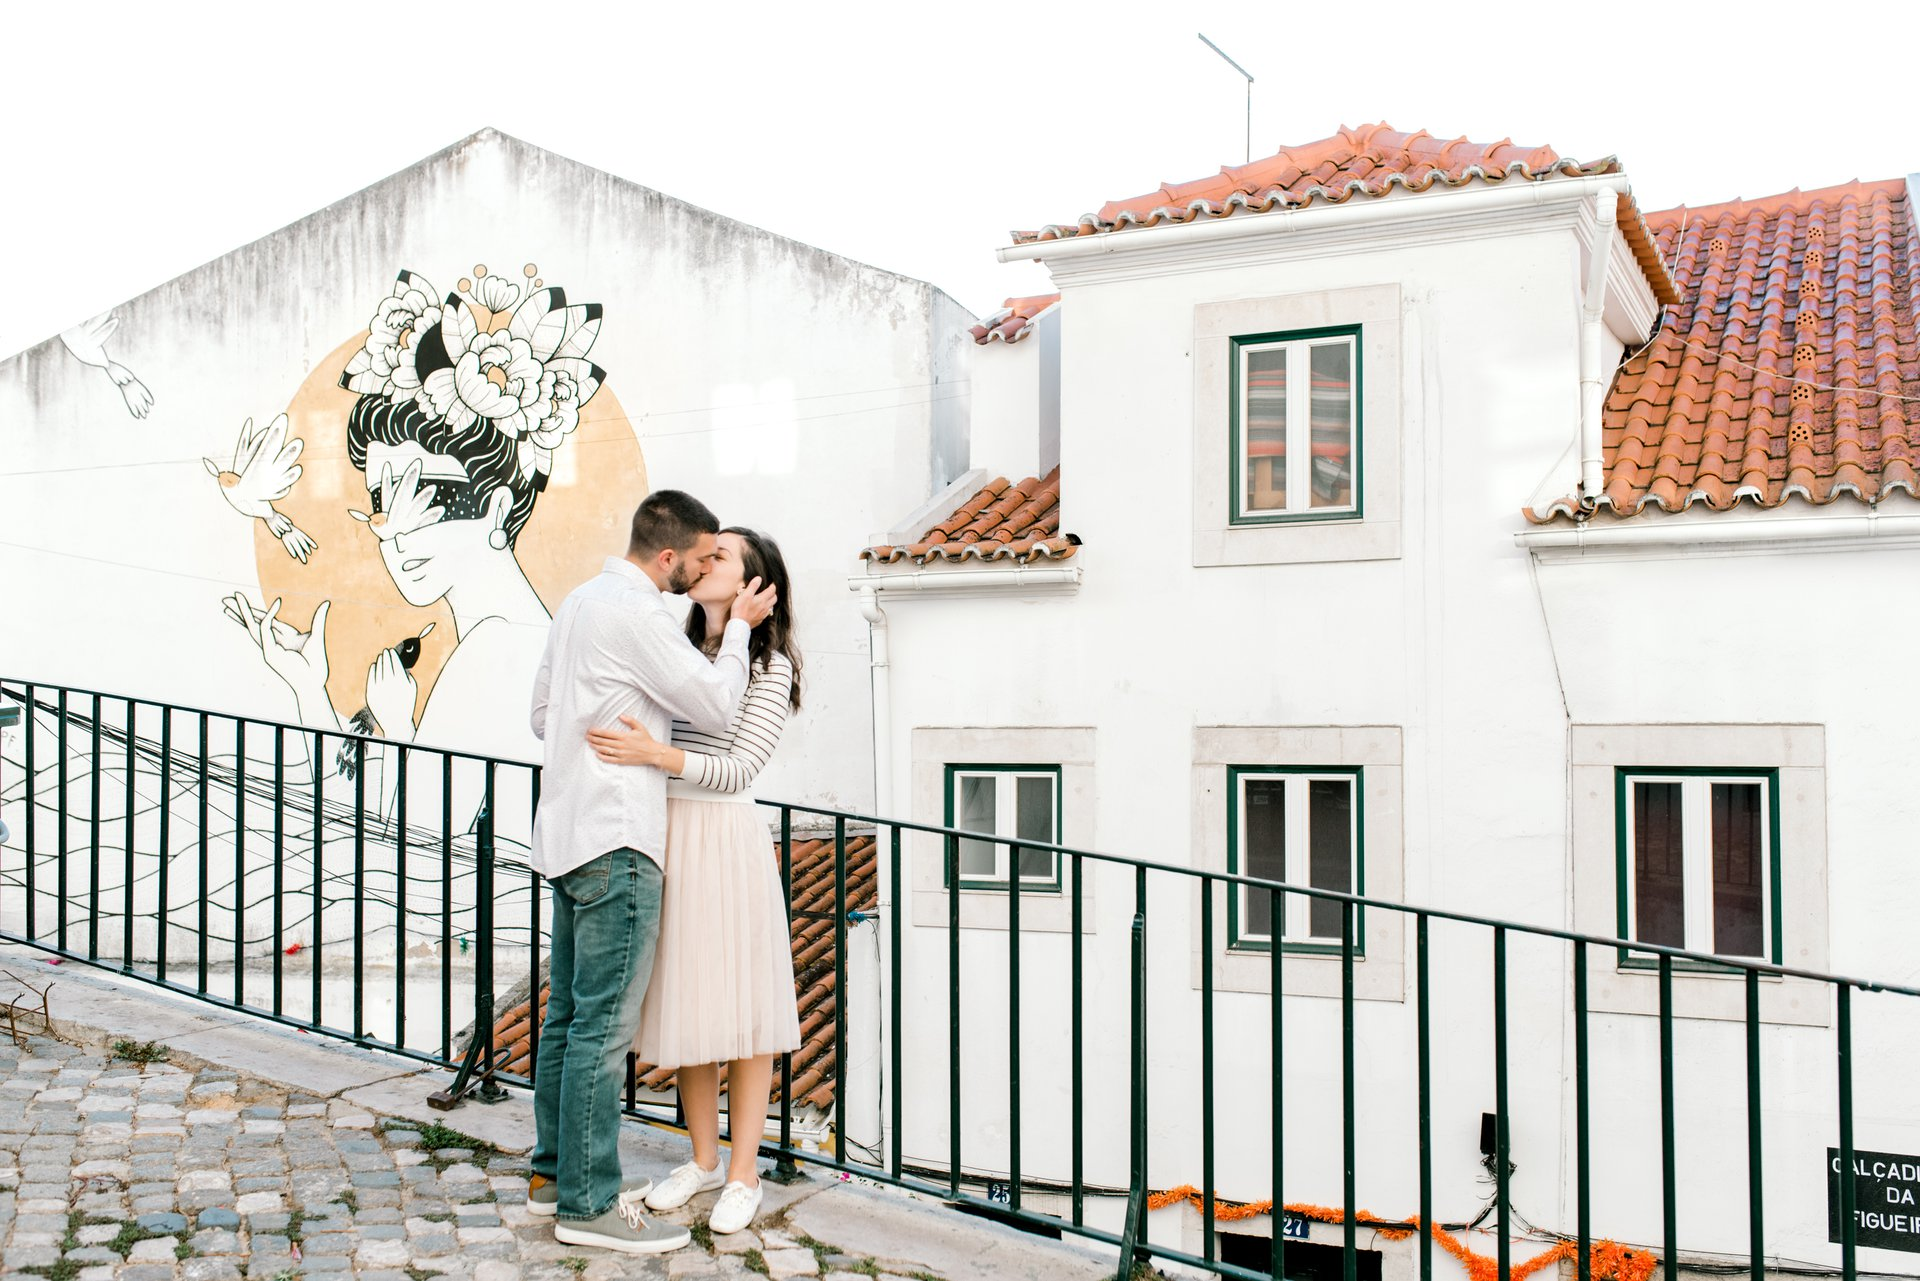 Lisbon-Portugal-travel-story-Flytographer-1